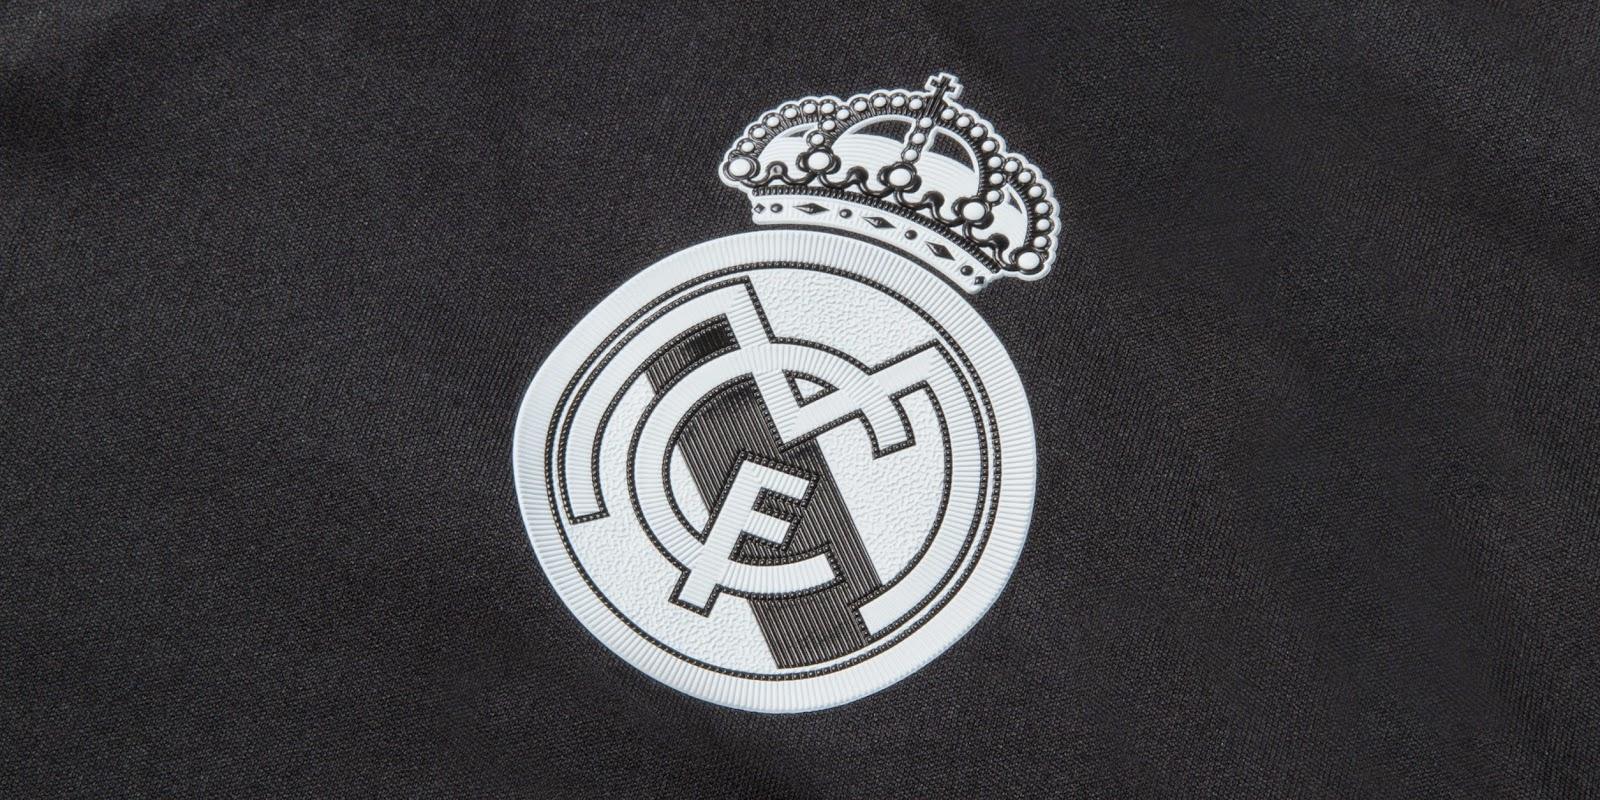 adidas Launch New Real Madrid C.F. 3rd kit  87a4733b2aa9b